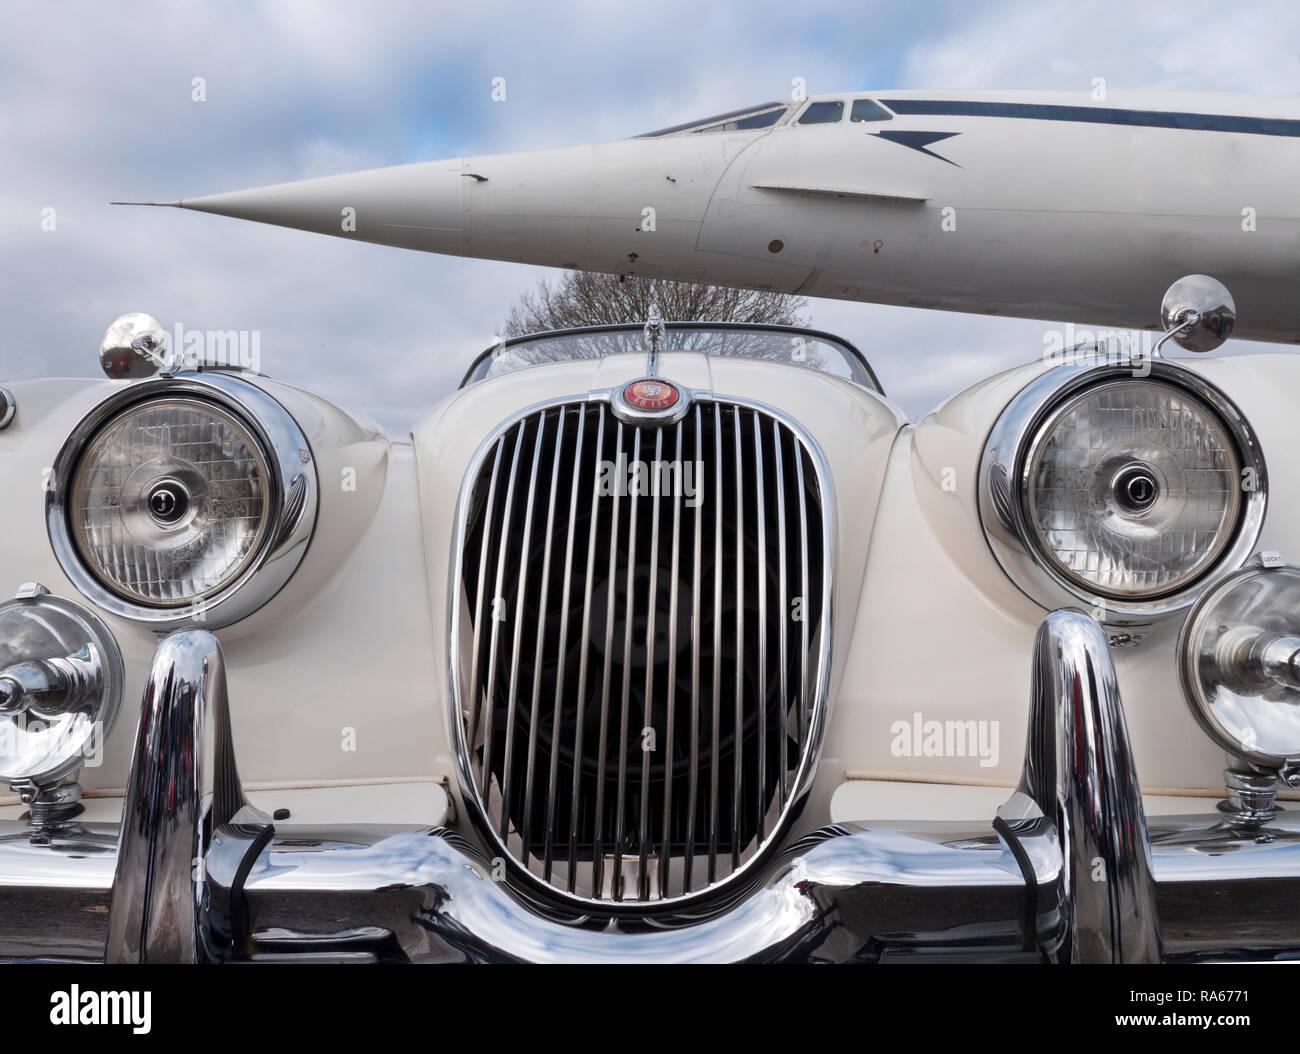 Weybridge, Surrey, UK. 1er janvier 2019. Le Brooklands Museum New Years Day Classic car la cueillette. Brooklands Weybridge, Surrey emplacement Road au Royaume-Uni. 01/01/2019 Credit: Cabanel/Alamy Live News Photo Stock